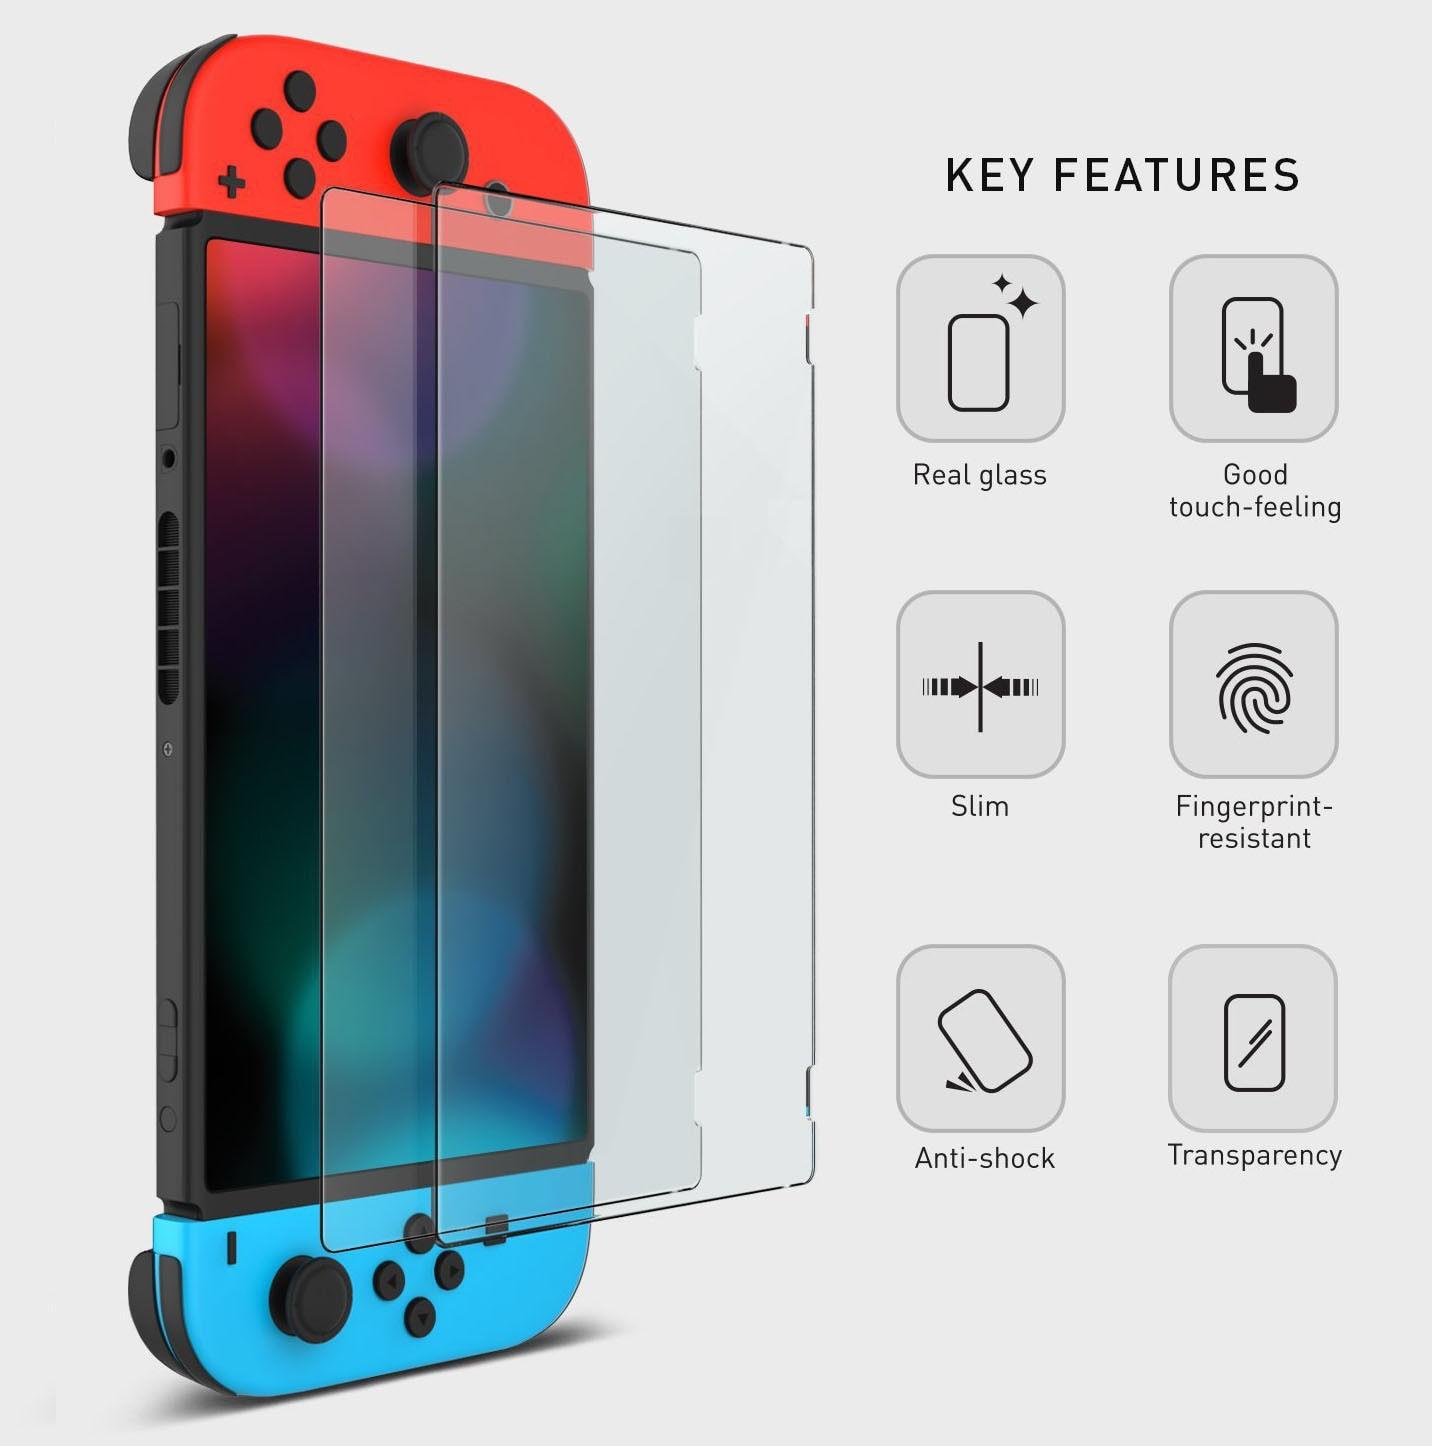 OSTENT 2 x protector de pantalla de película de vidrio templado protector de piel para consola Nintendo Switch